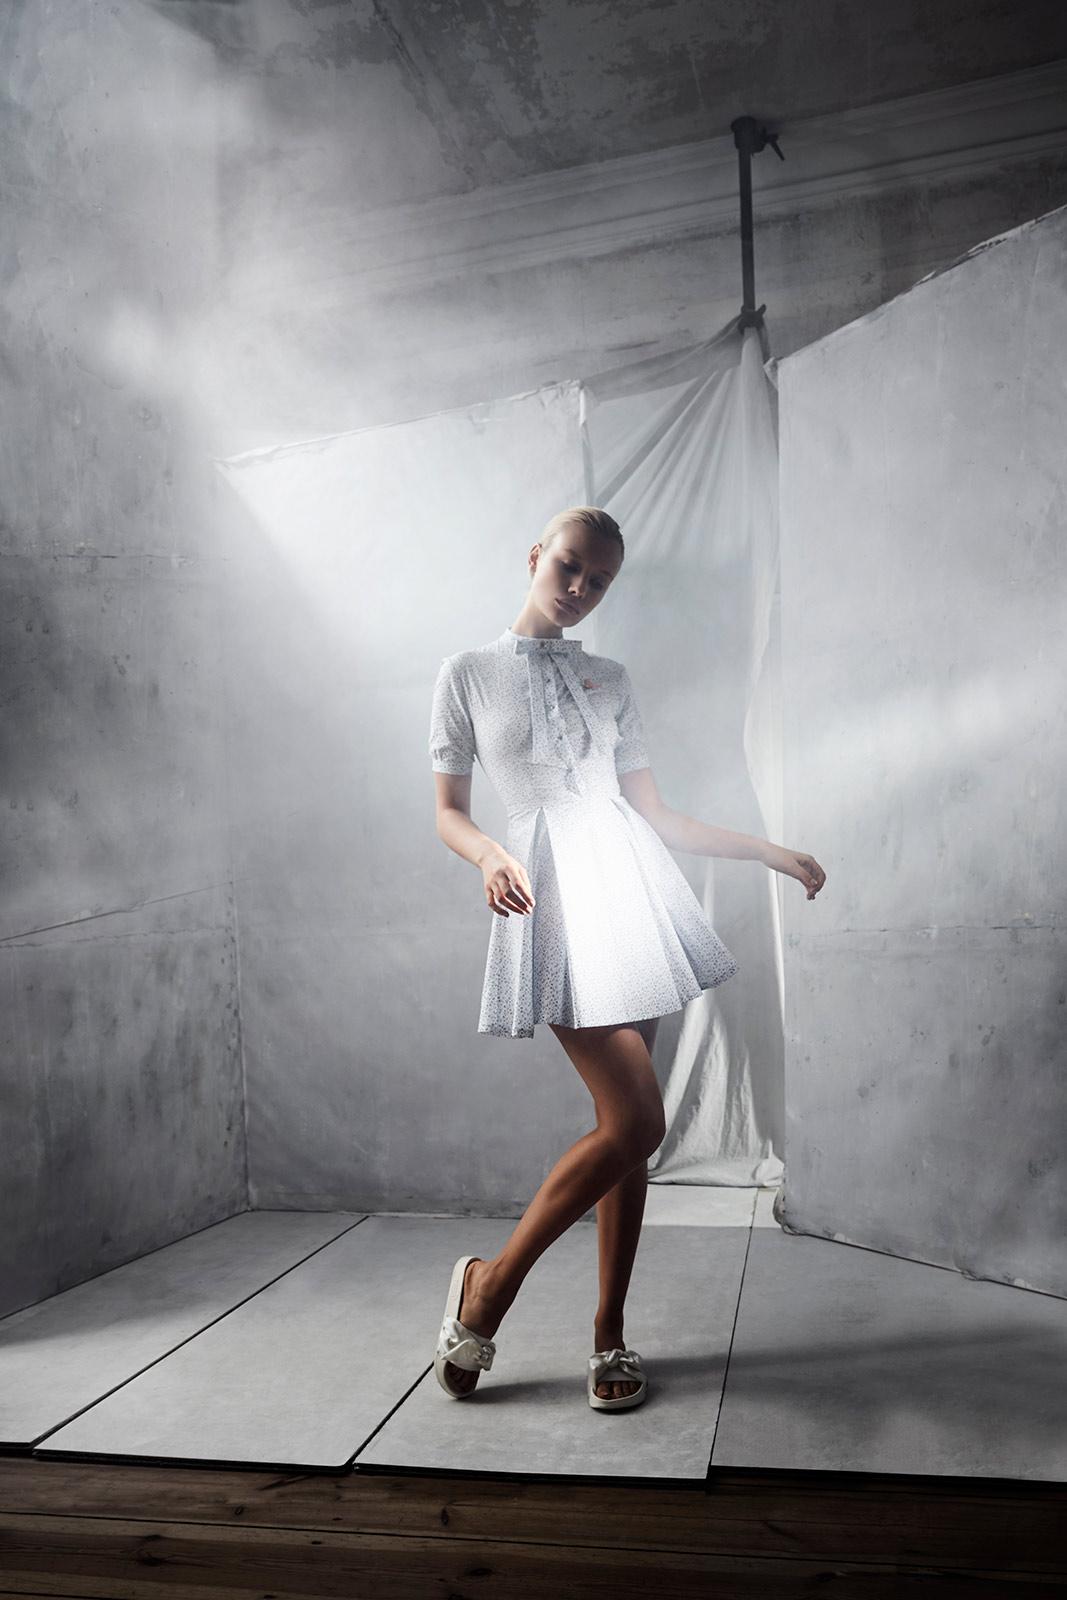 2017_05_11-Masterclass-Fashion5256-Kopie